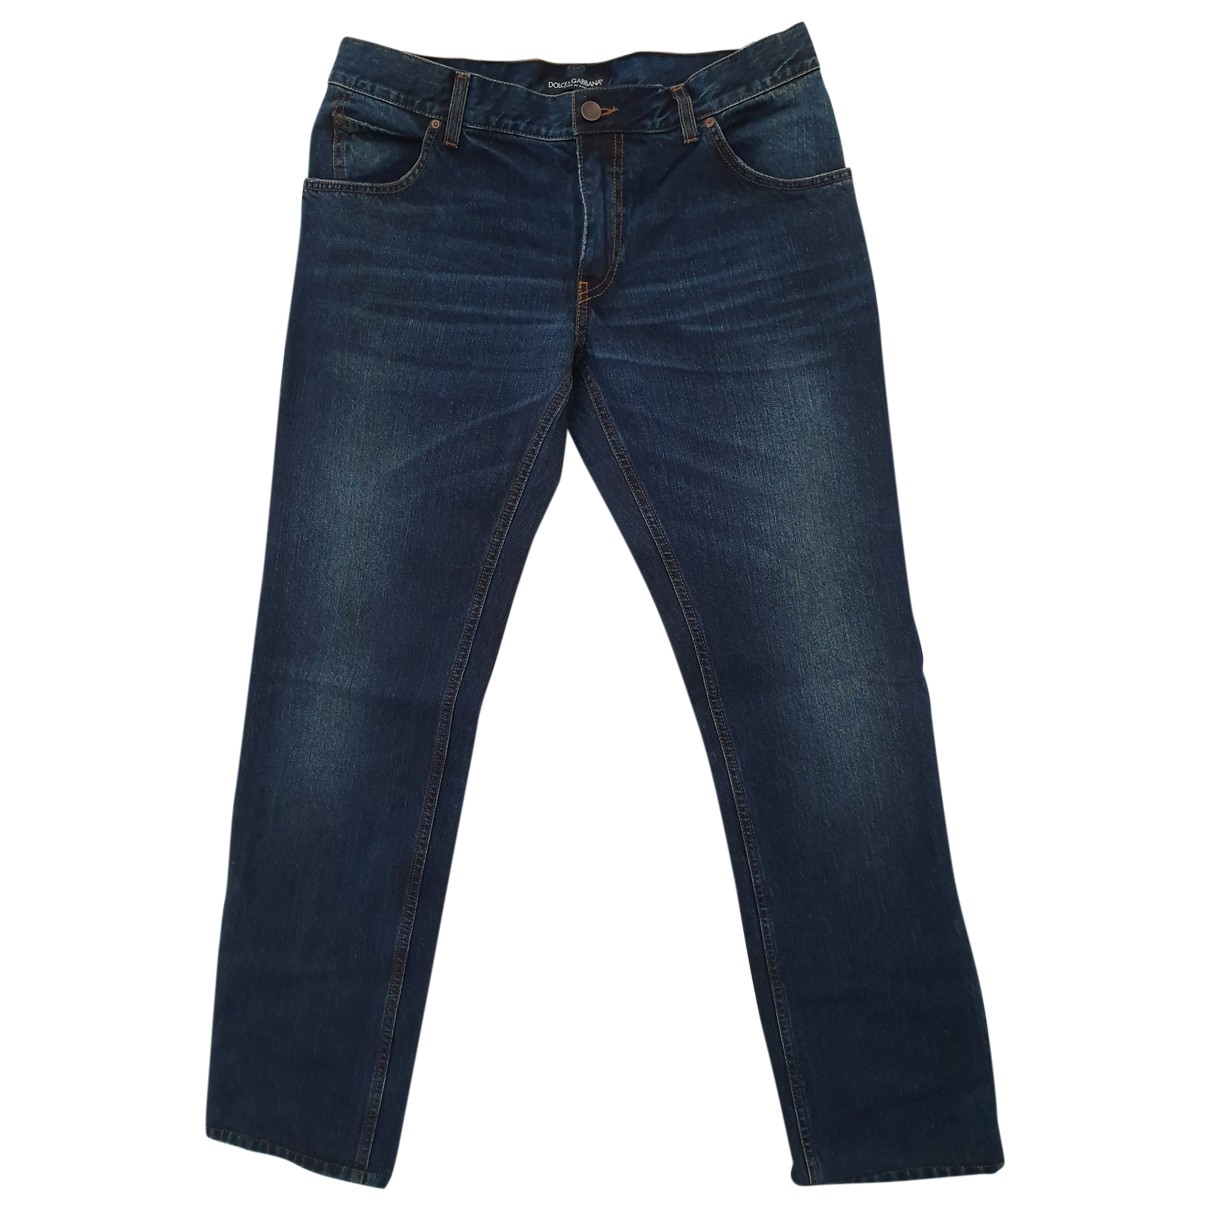 Dolce & Gabbana \N Navy Cotton Jeans for Men 46 FR